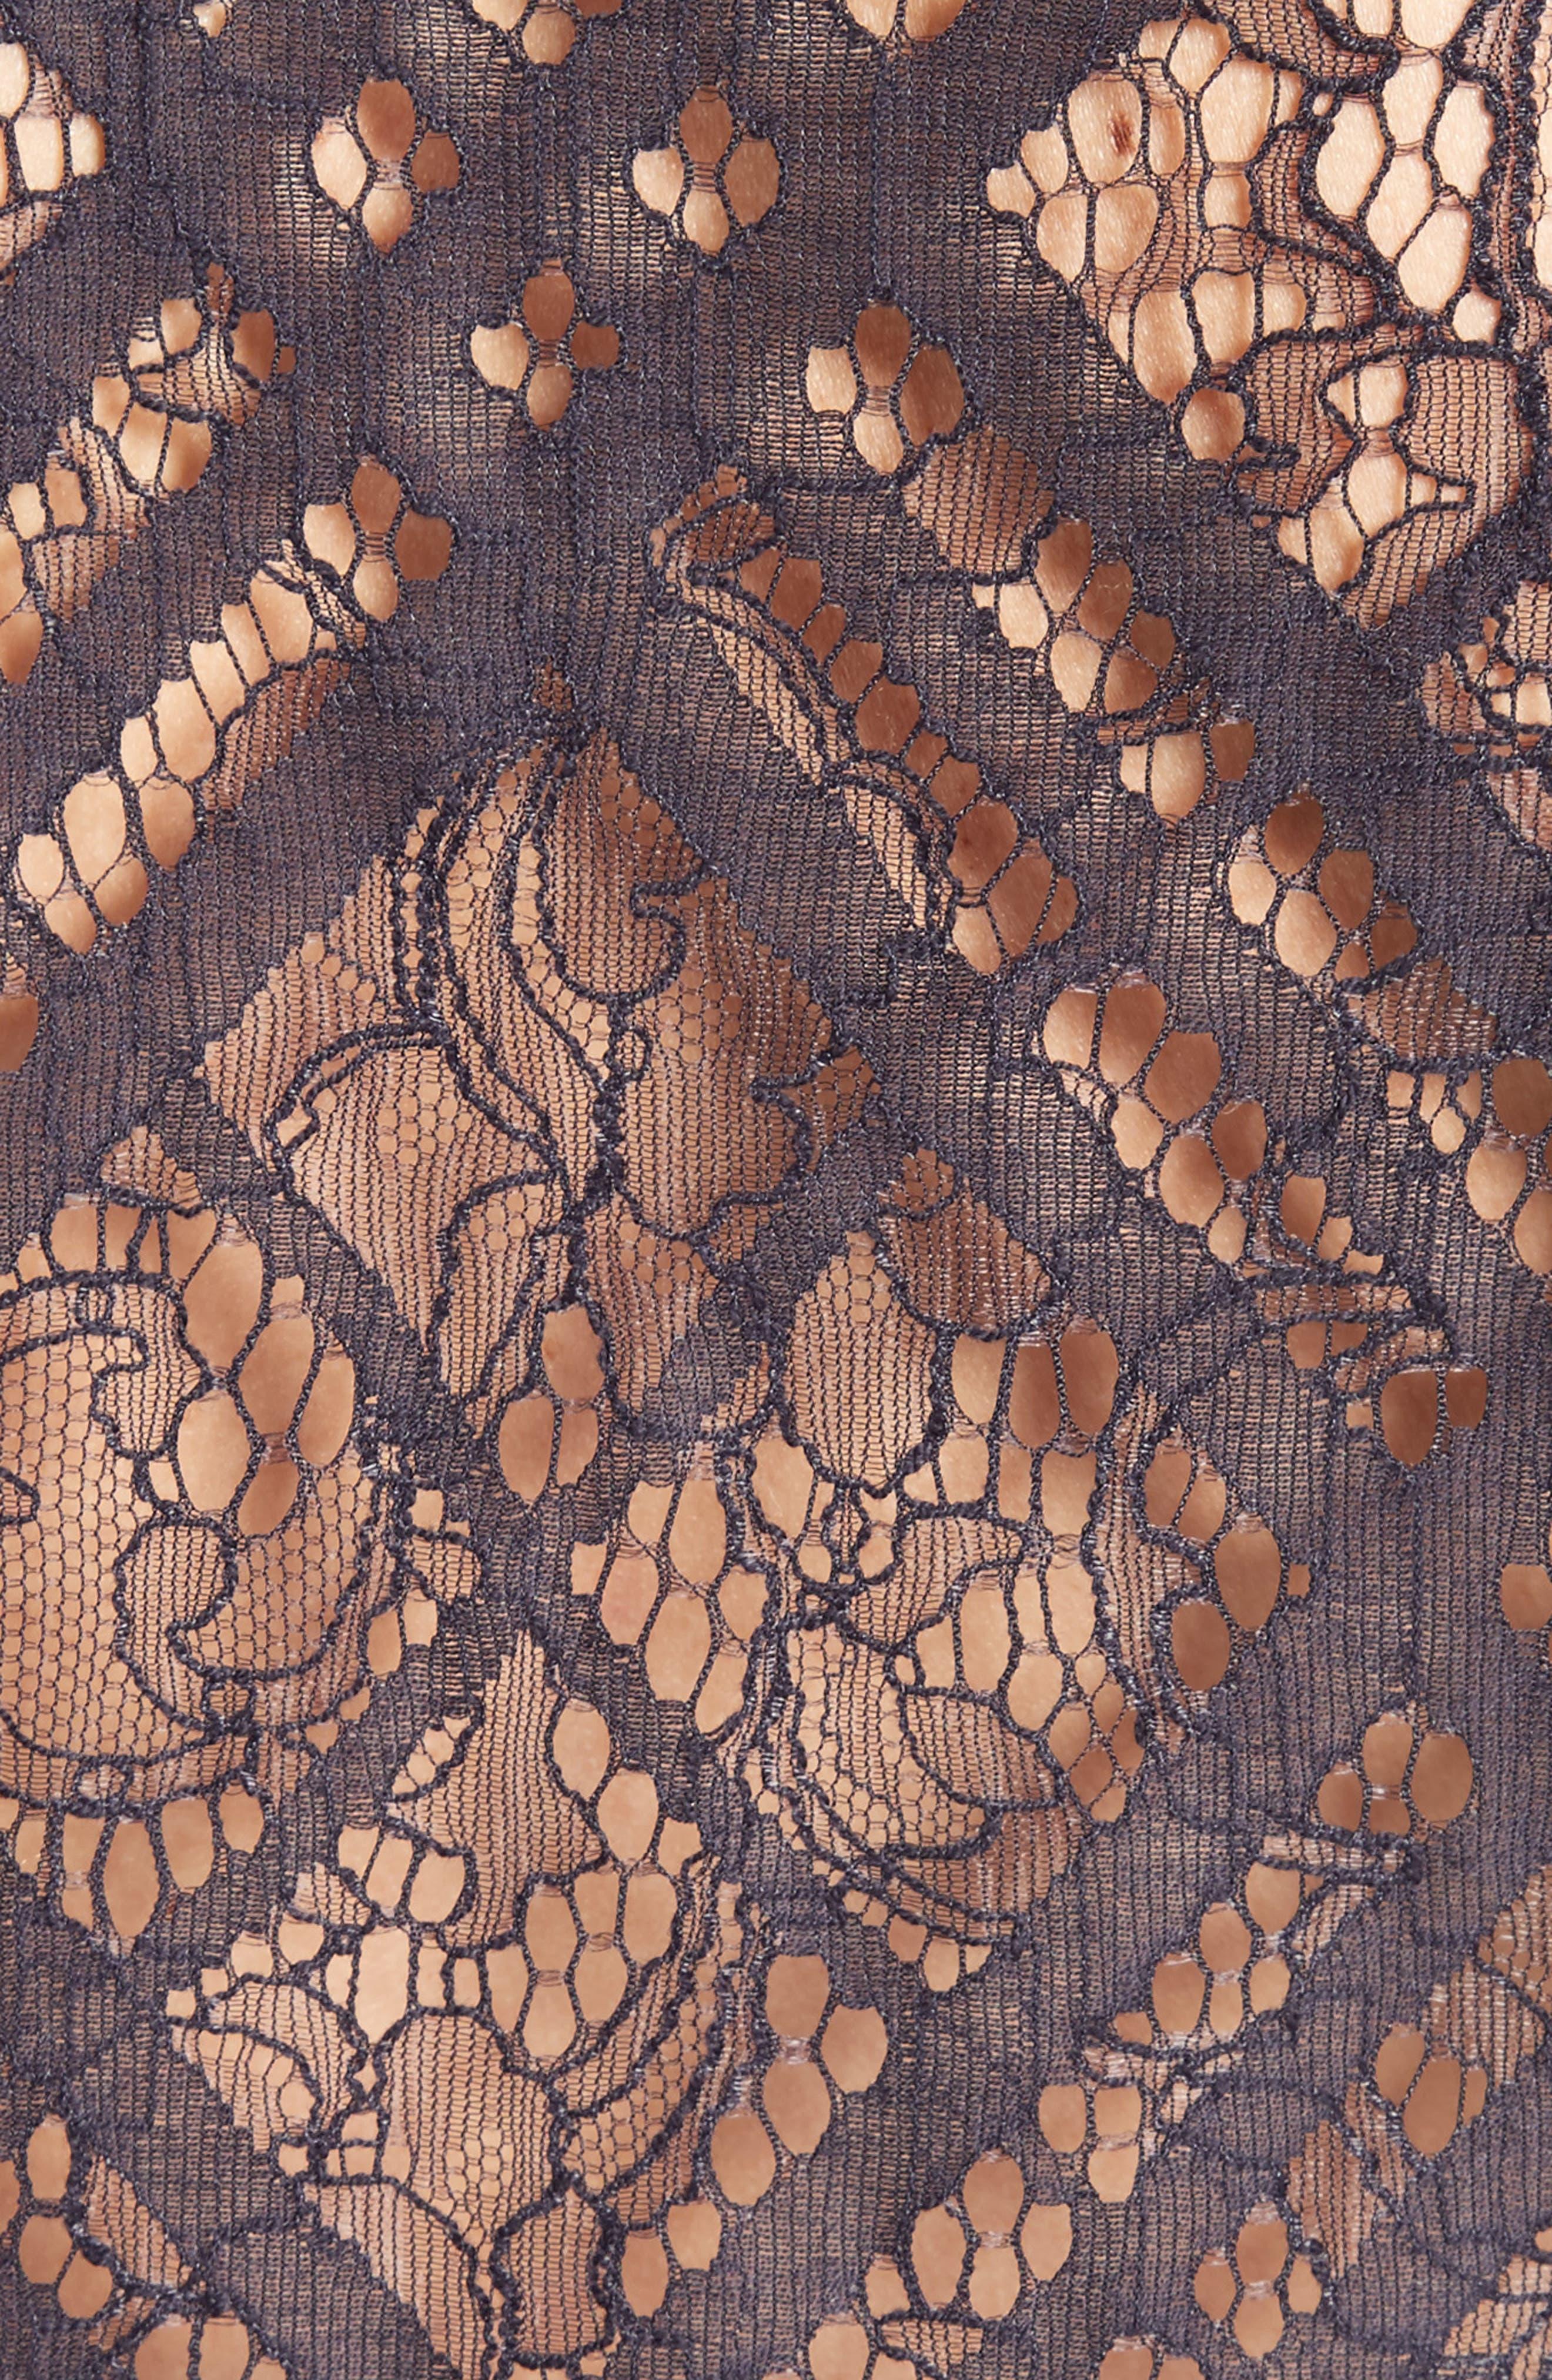 Aster Check Lace Shirt,                             Alternate thumbnail 5, color,                             410